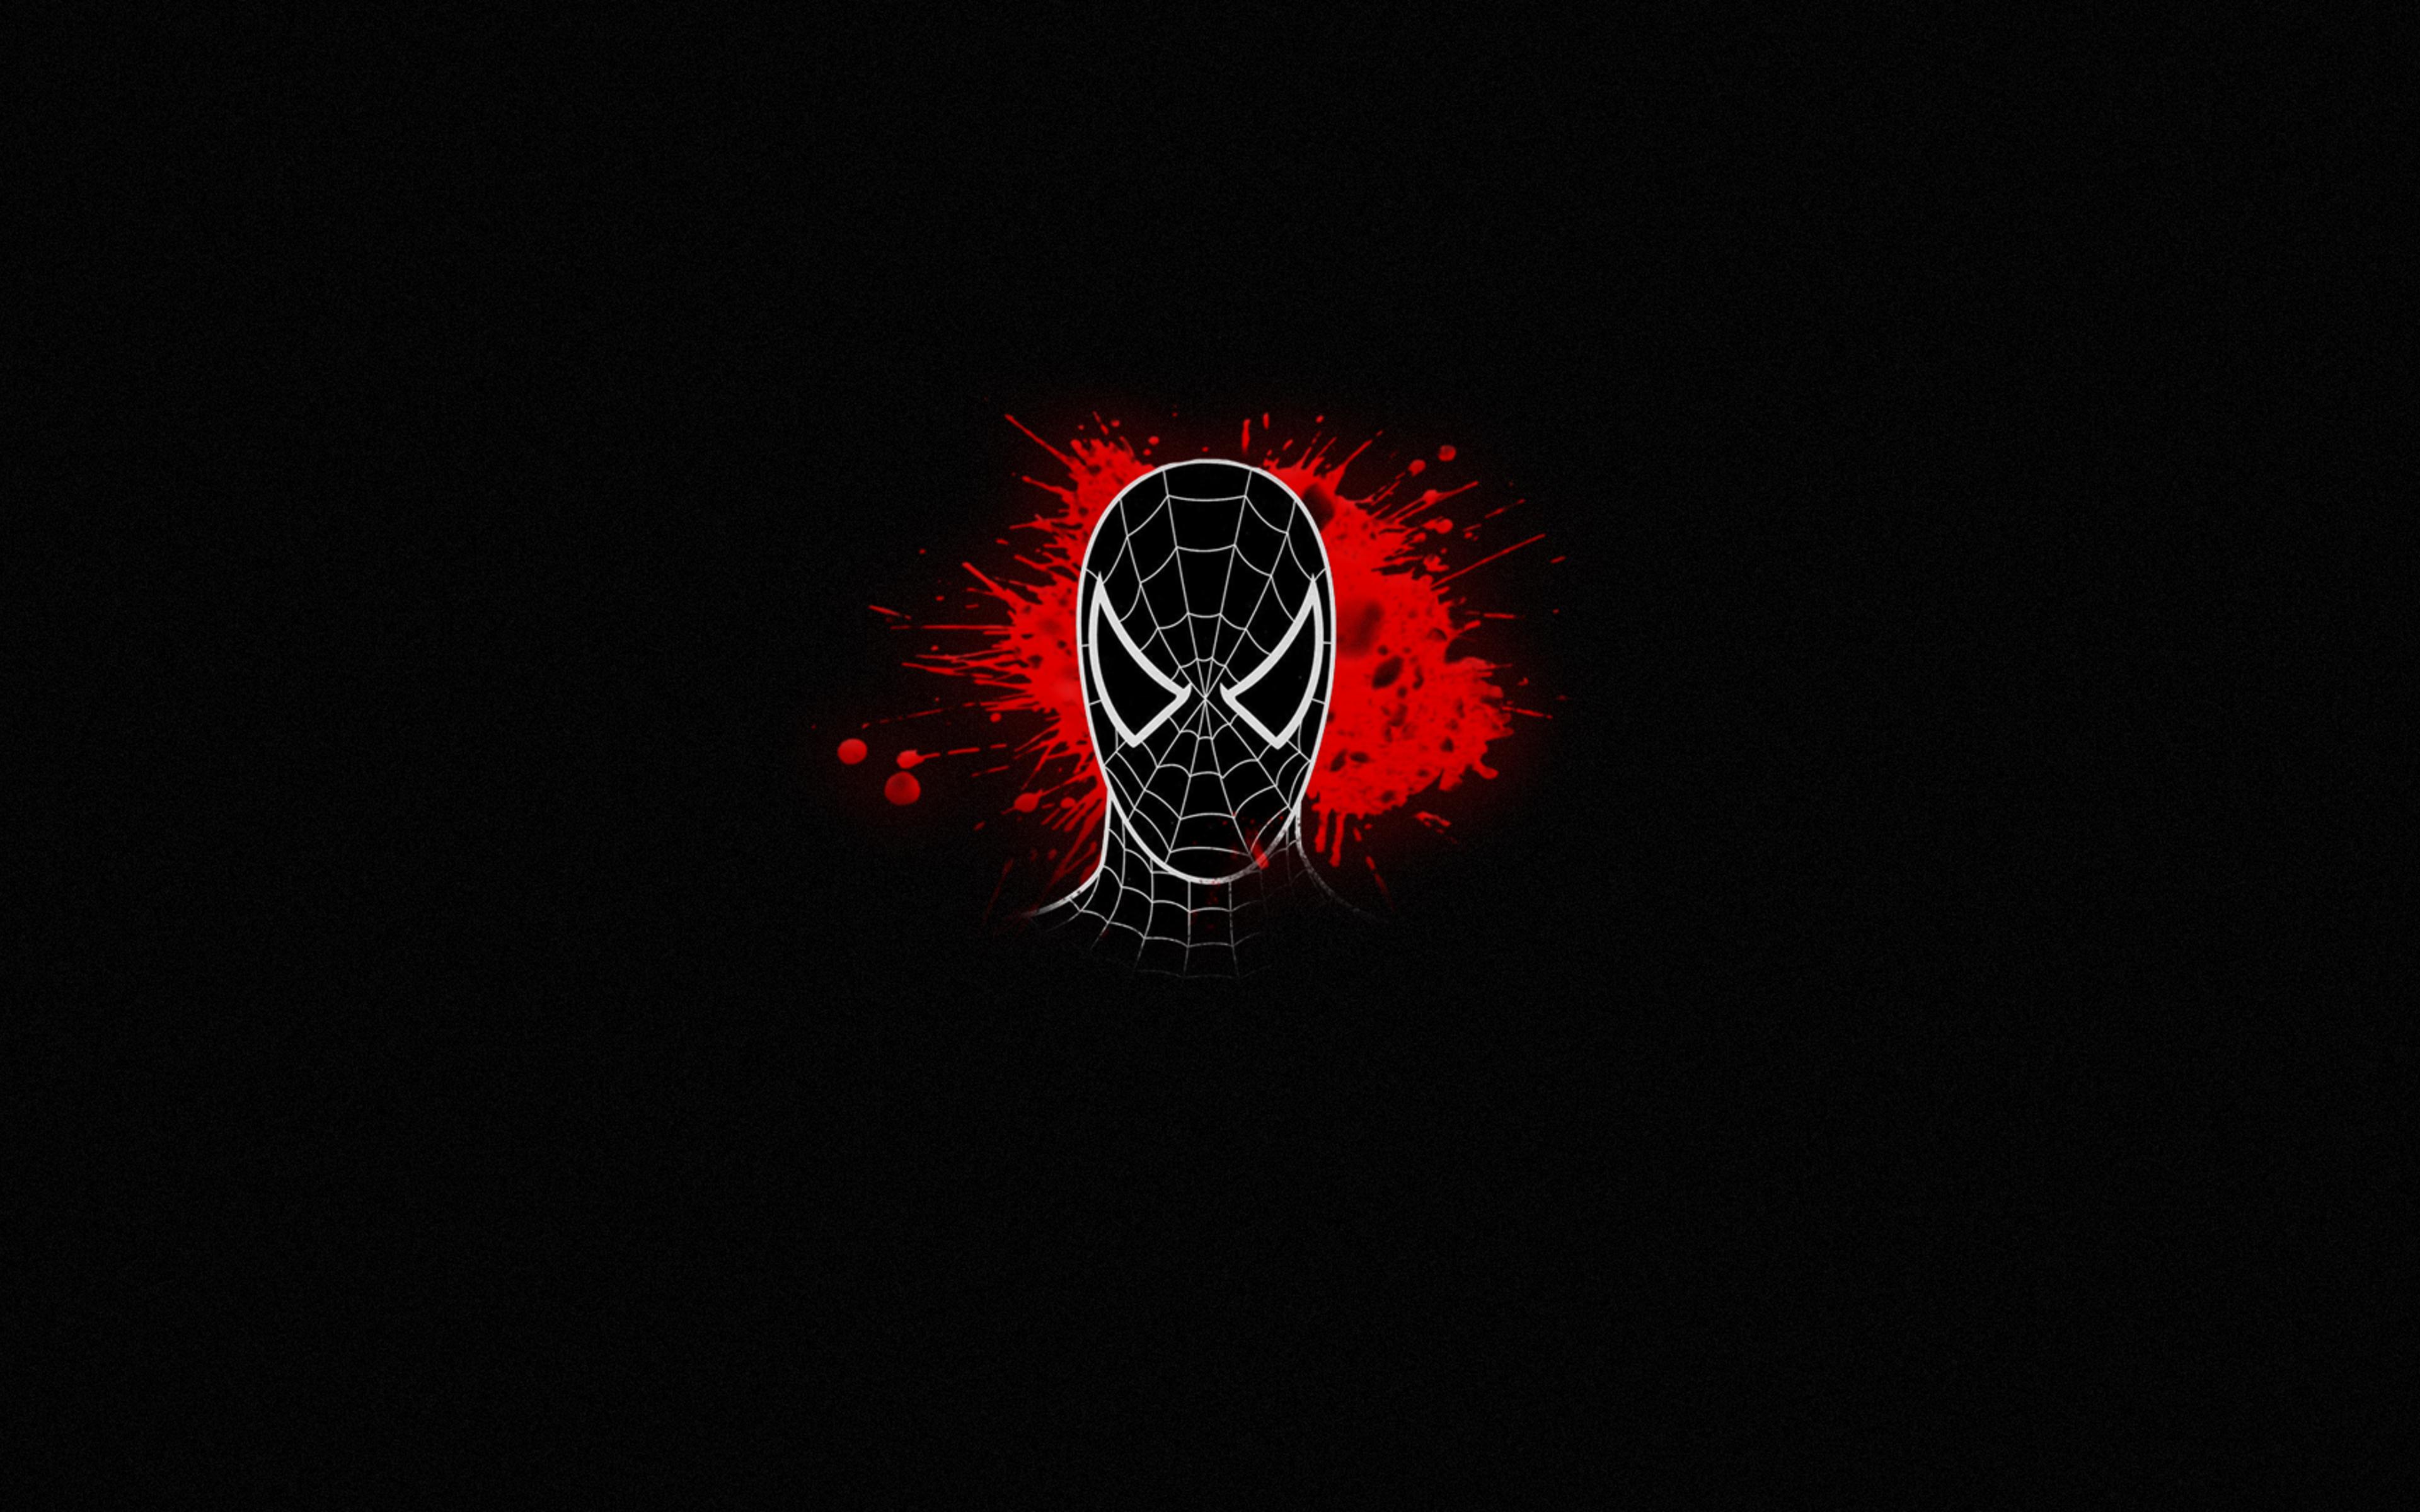 spiderman-comic-minimalism-ve.jpg